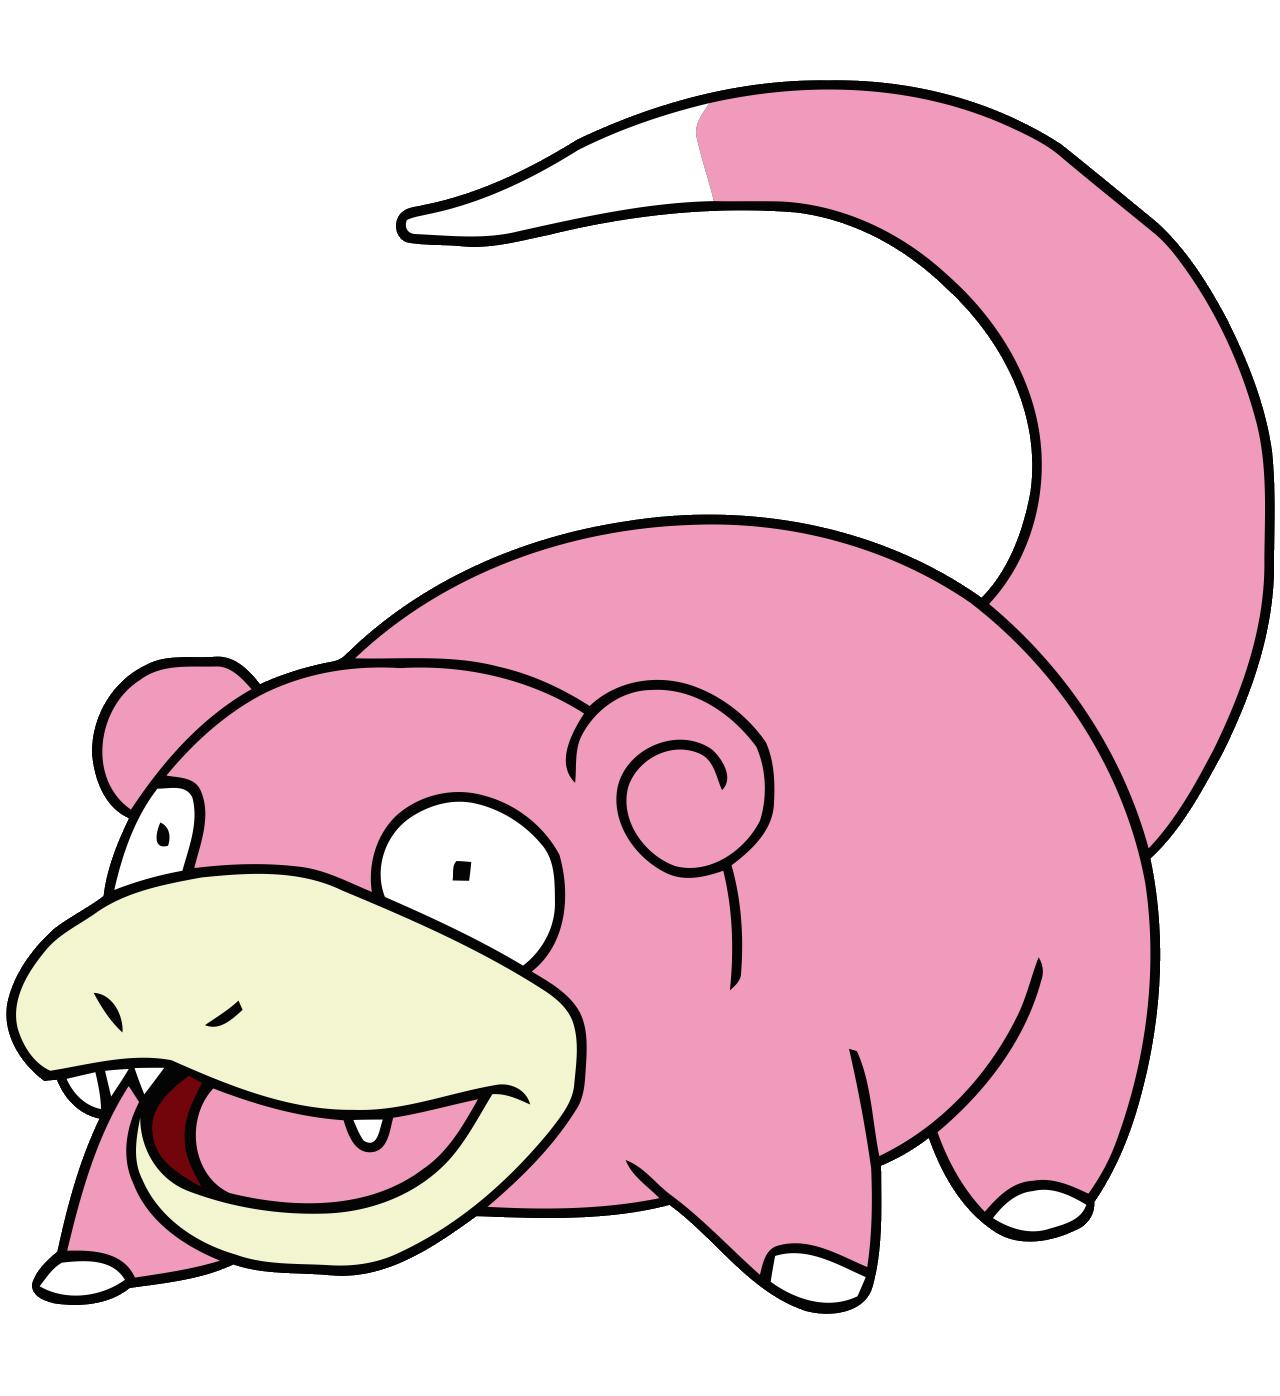 Baguseven blog: Real Pokemon